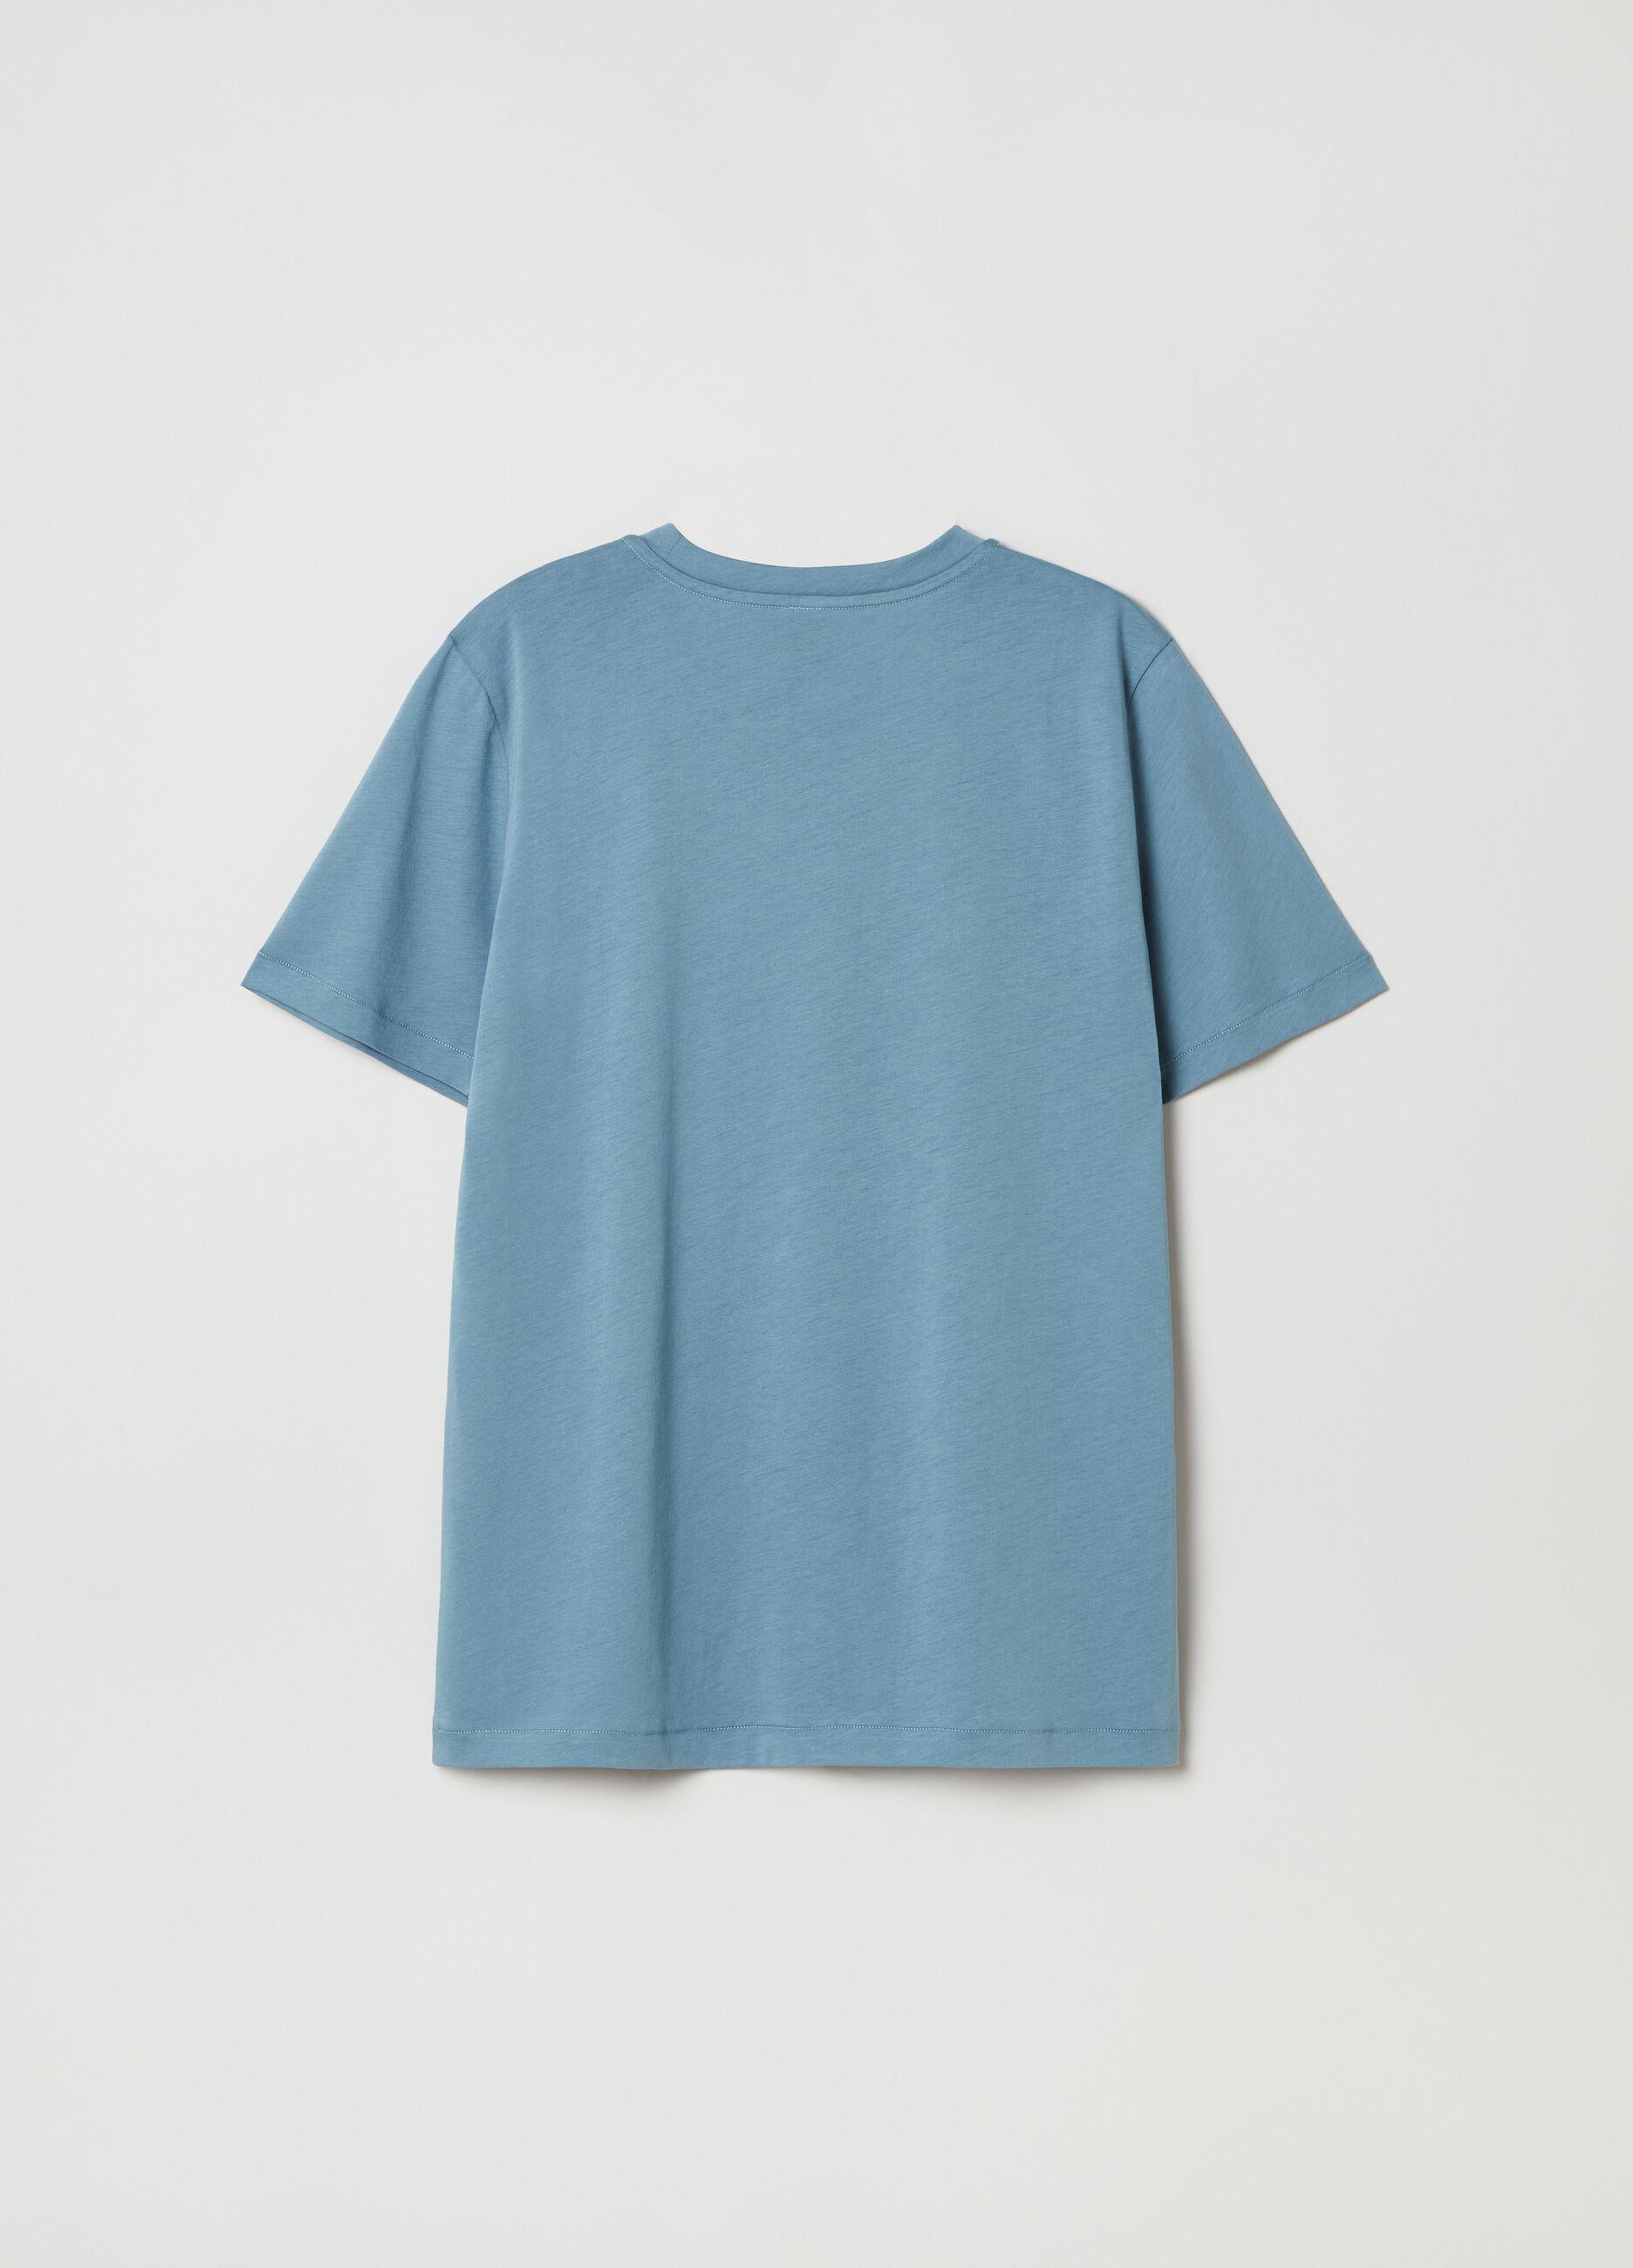 T-shirt in cotone Supima Blu